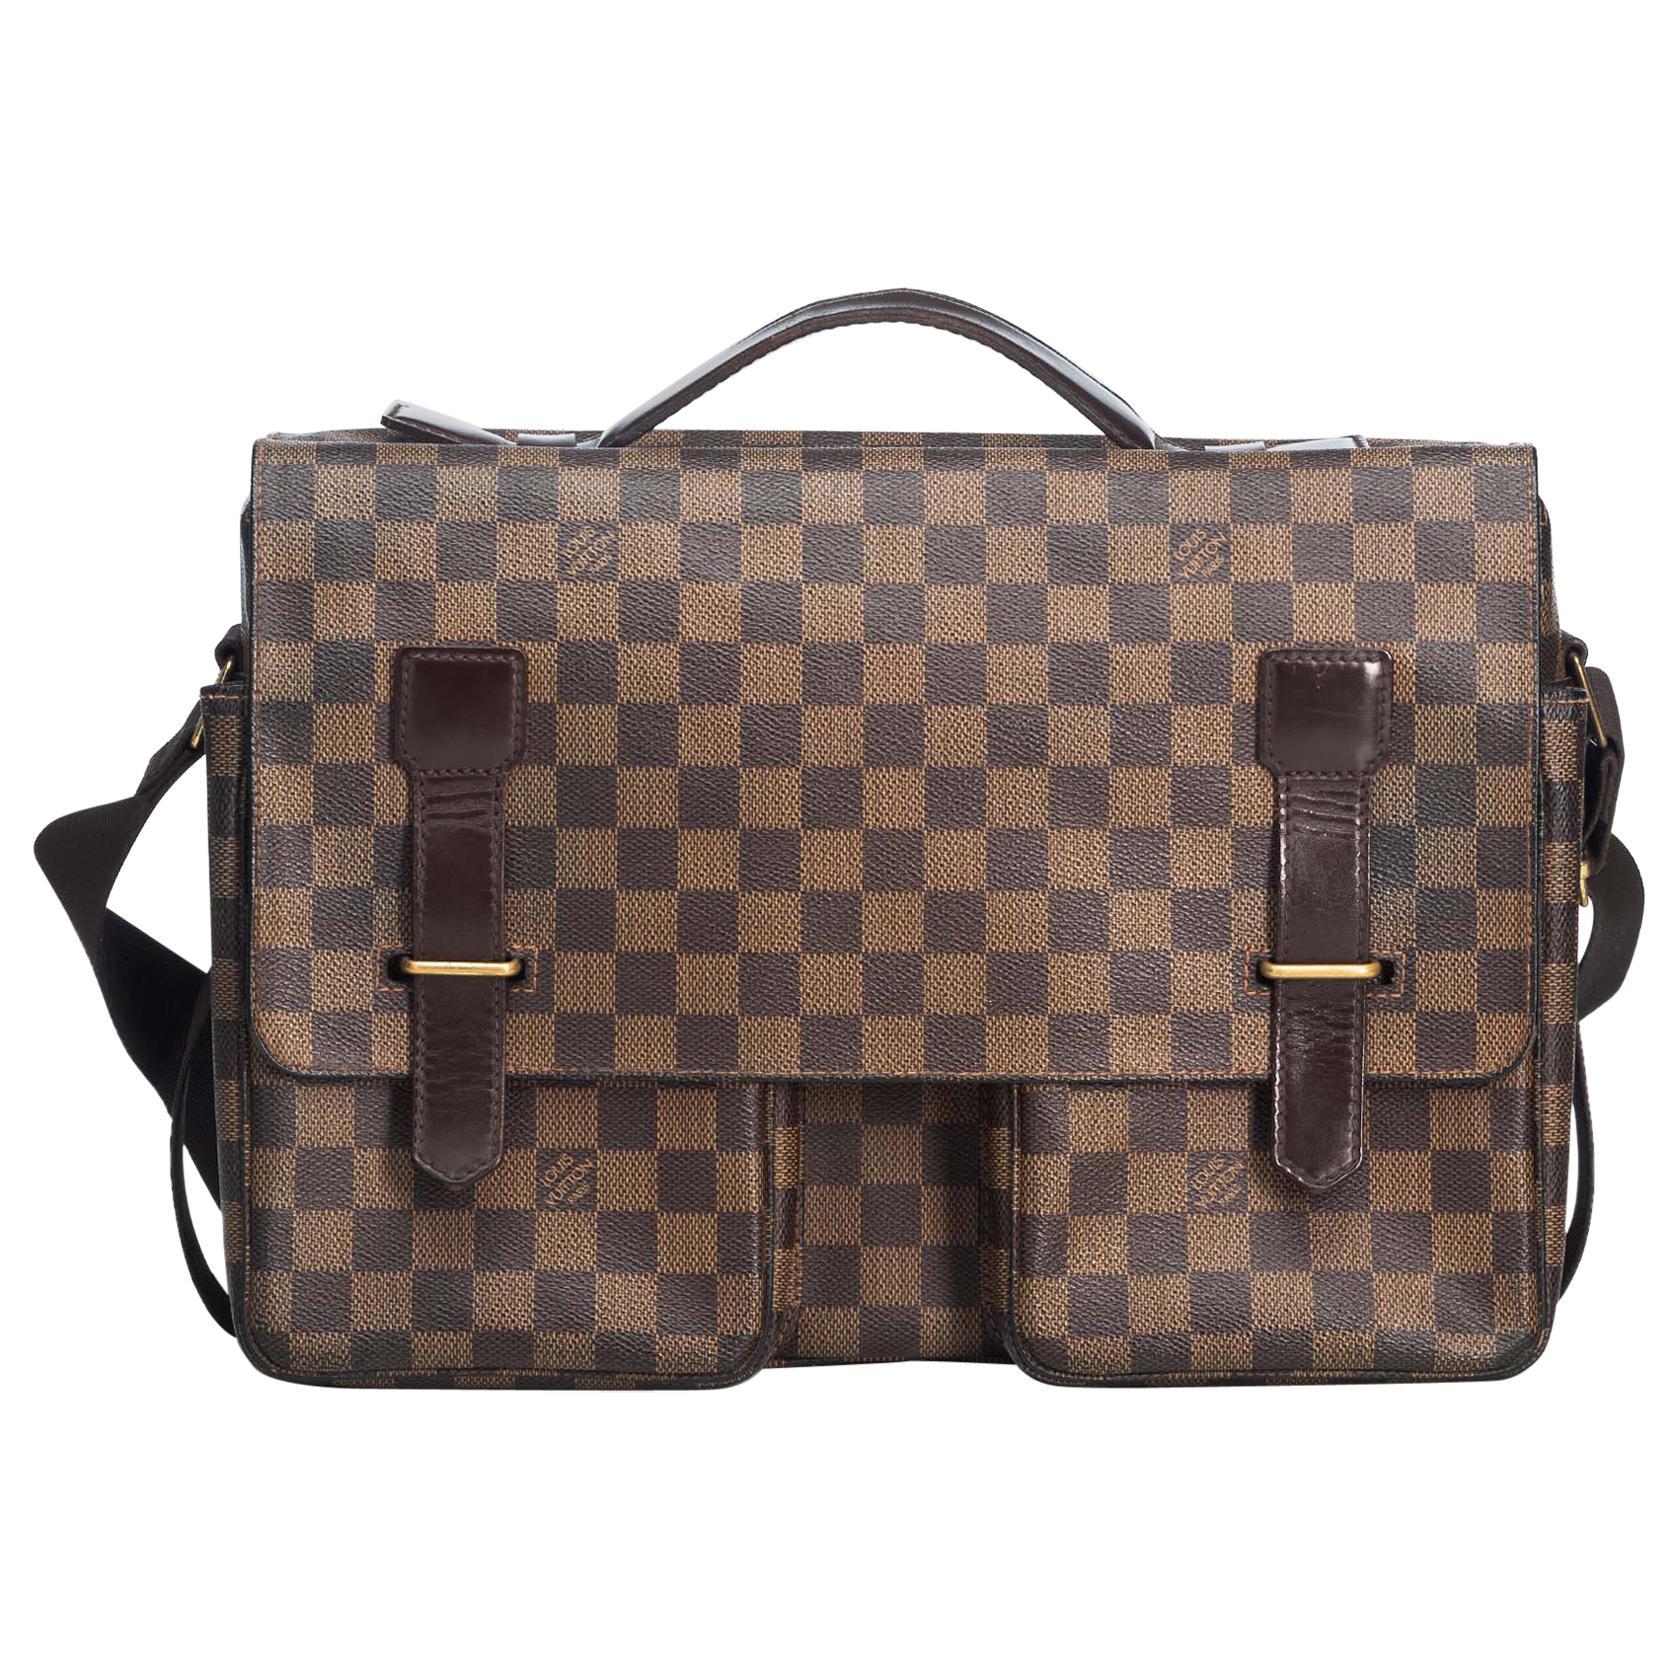 06809e90d Louis Vuitton Dandy Briefcase Epi Leather MM at 1stdibs